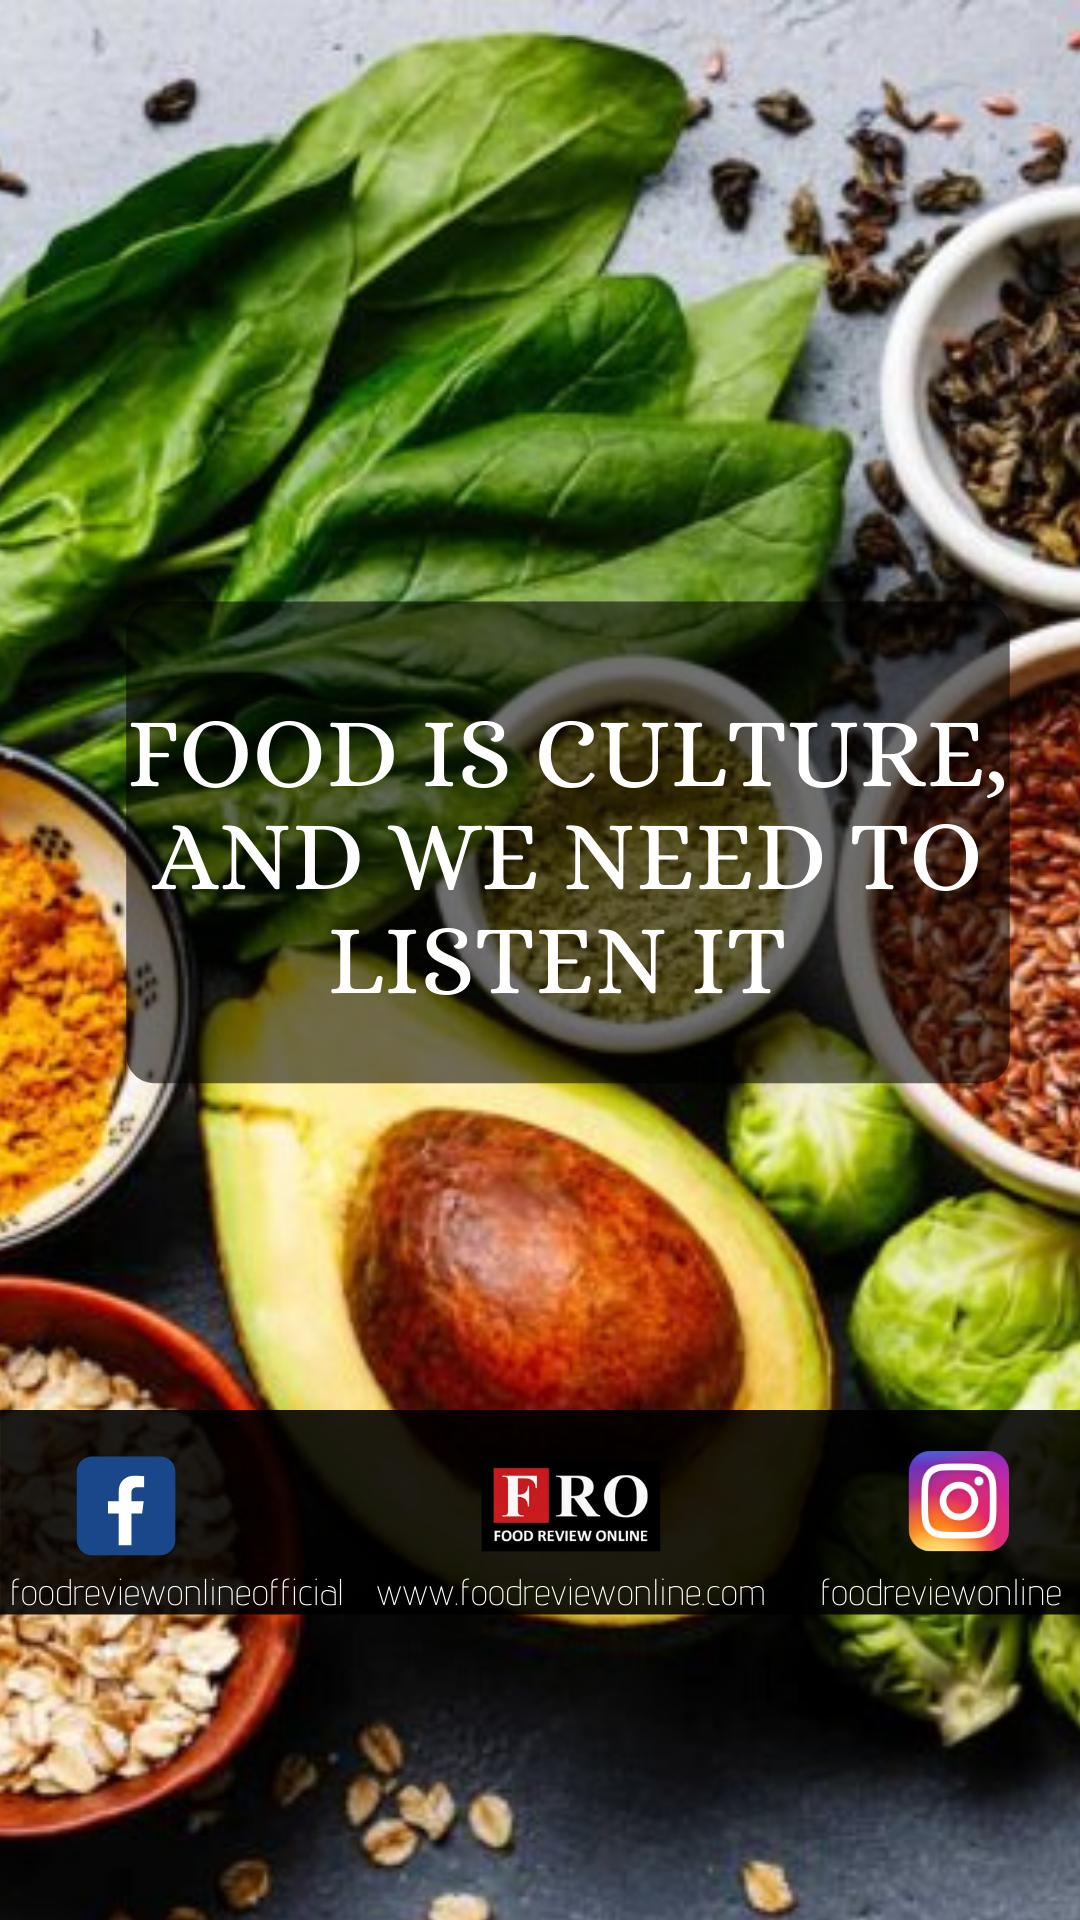 #foodreviewonline #kailashshahaniofficial #foodie #foodart #foodnetwork #foodblog #foodgram #foodlovers #fooddiary #quoteforfoodies #foodquotes #Tuesdaythoughts #foodietuesday #mumbaifoodie #foodsofmumbai